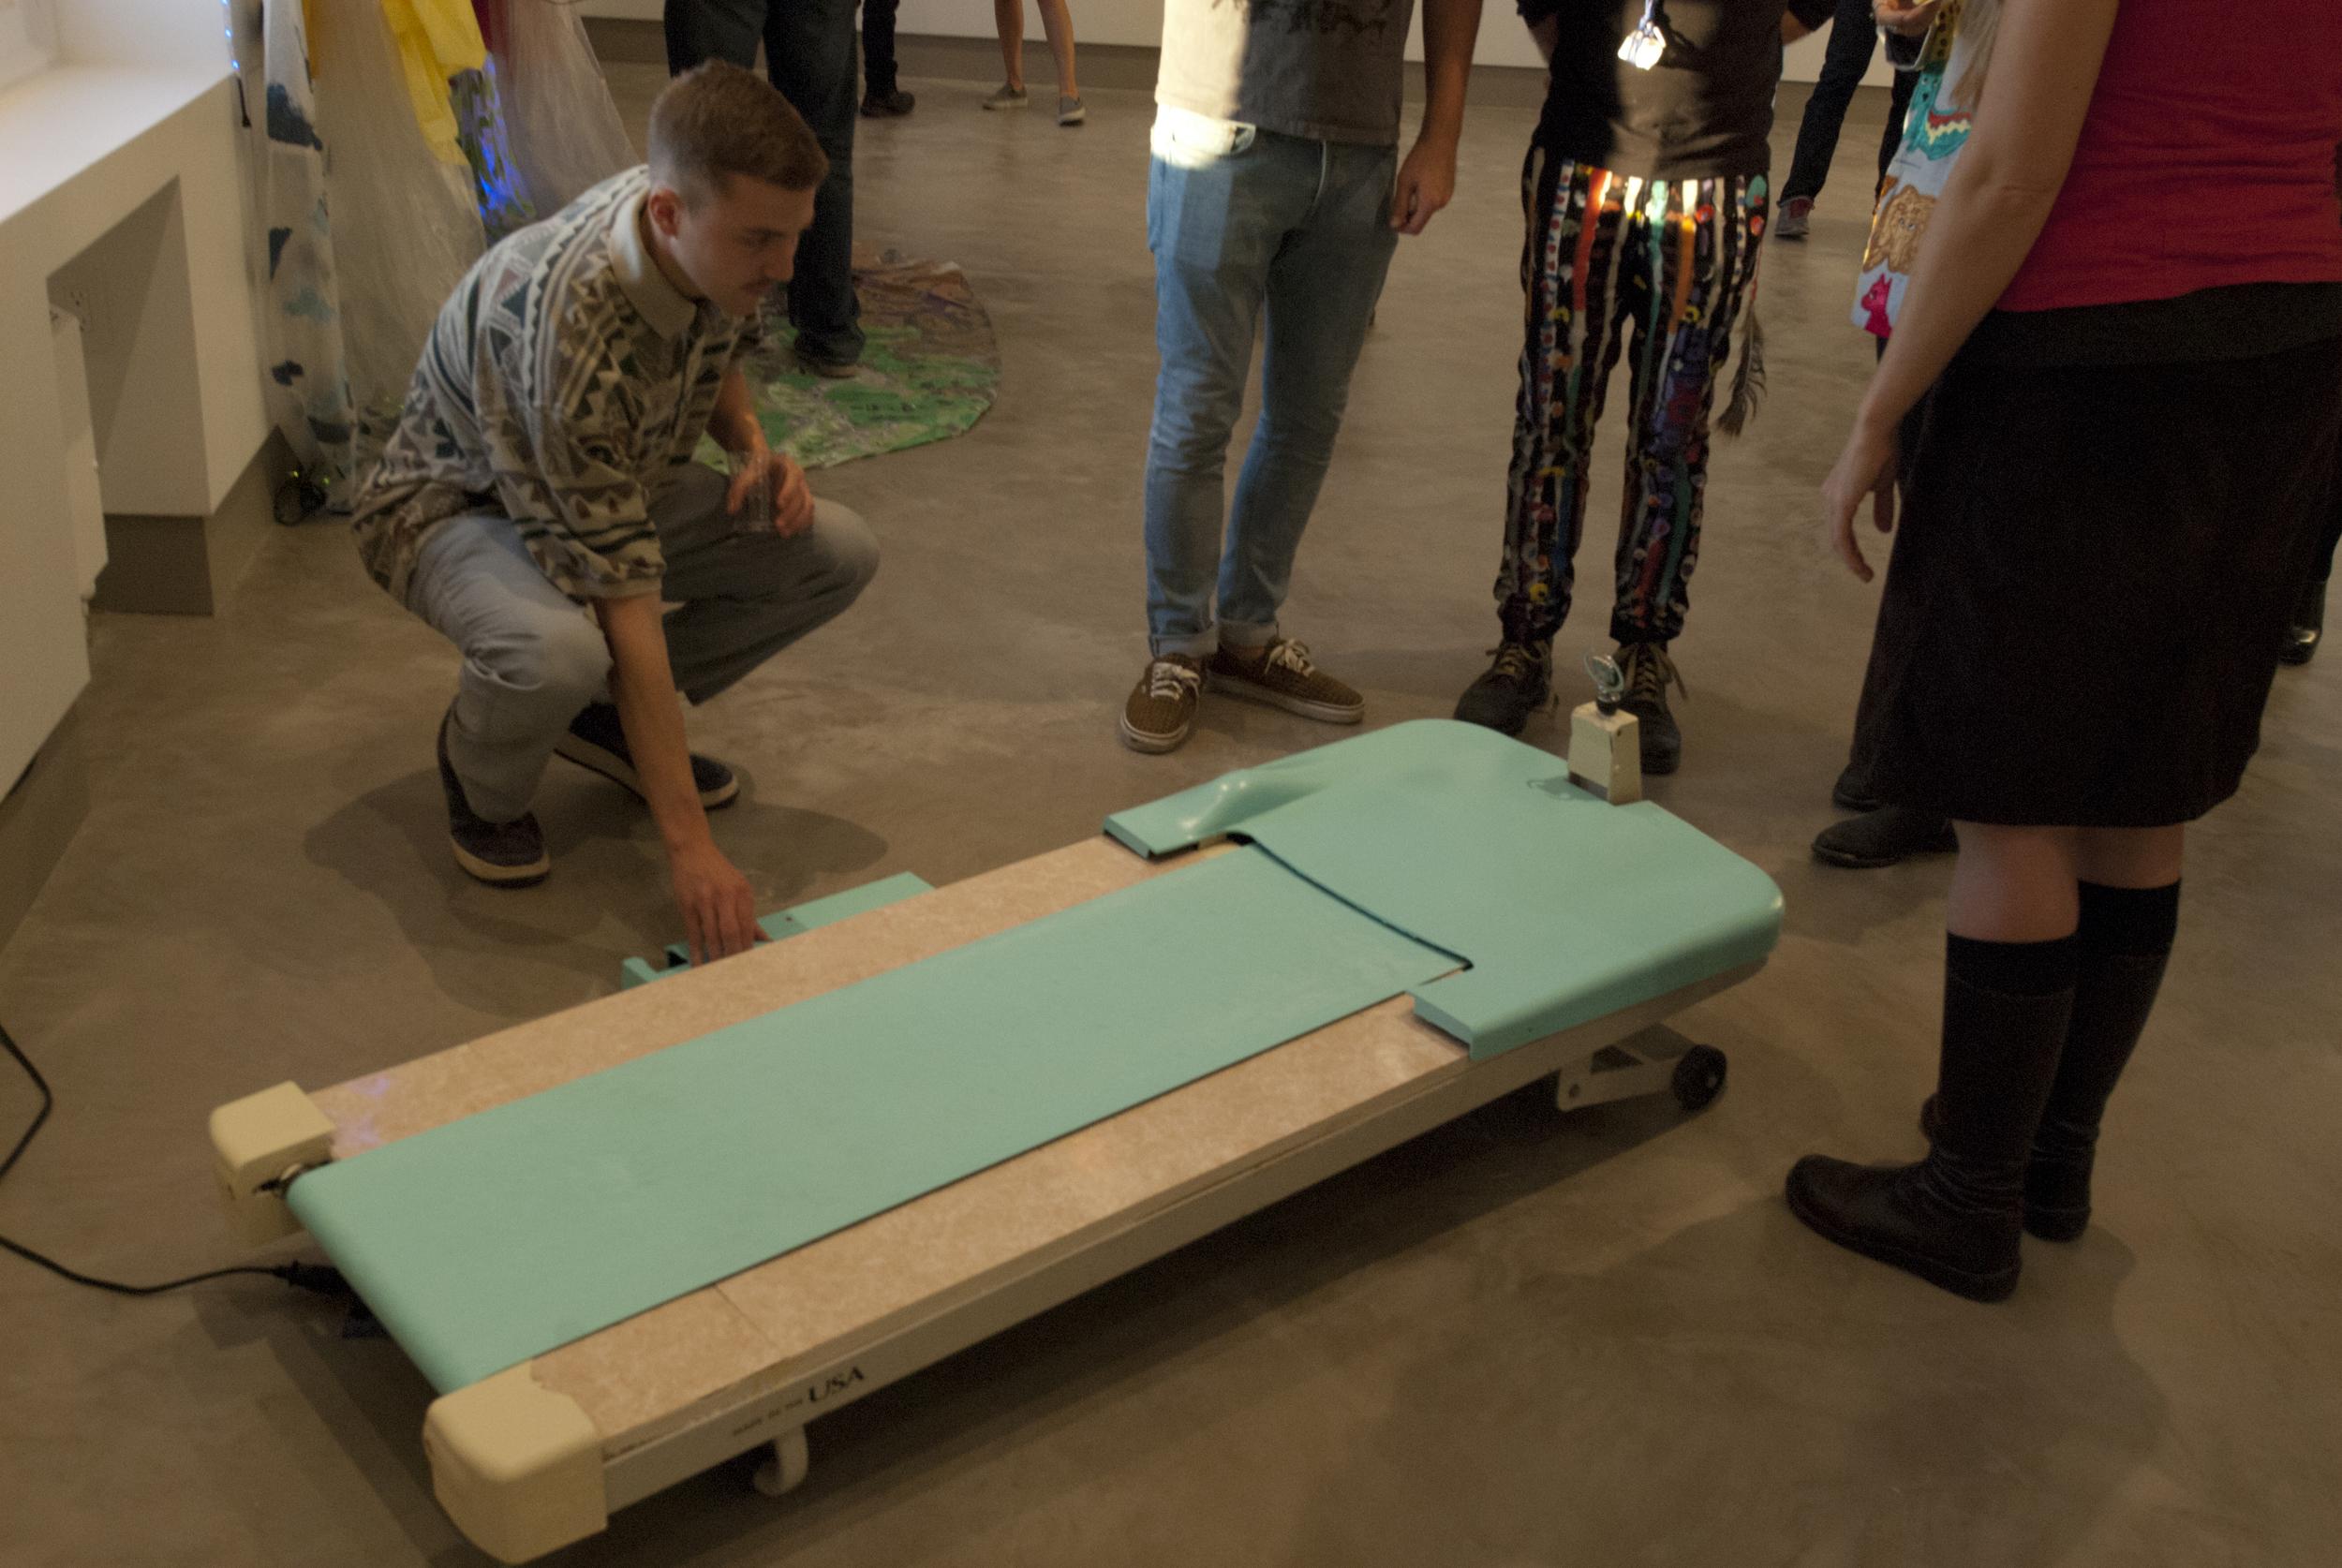 Matt Goldberg showcases his sculpture Cadillac Treadmill  in movement  to fellow artists.